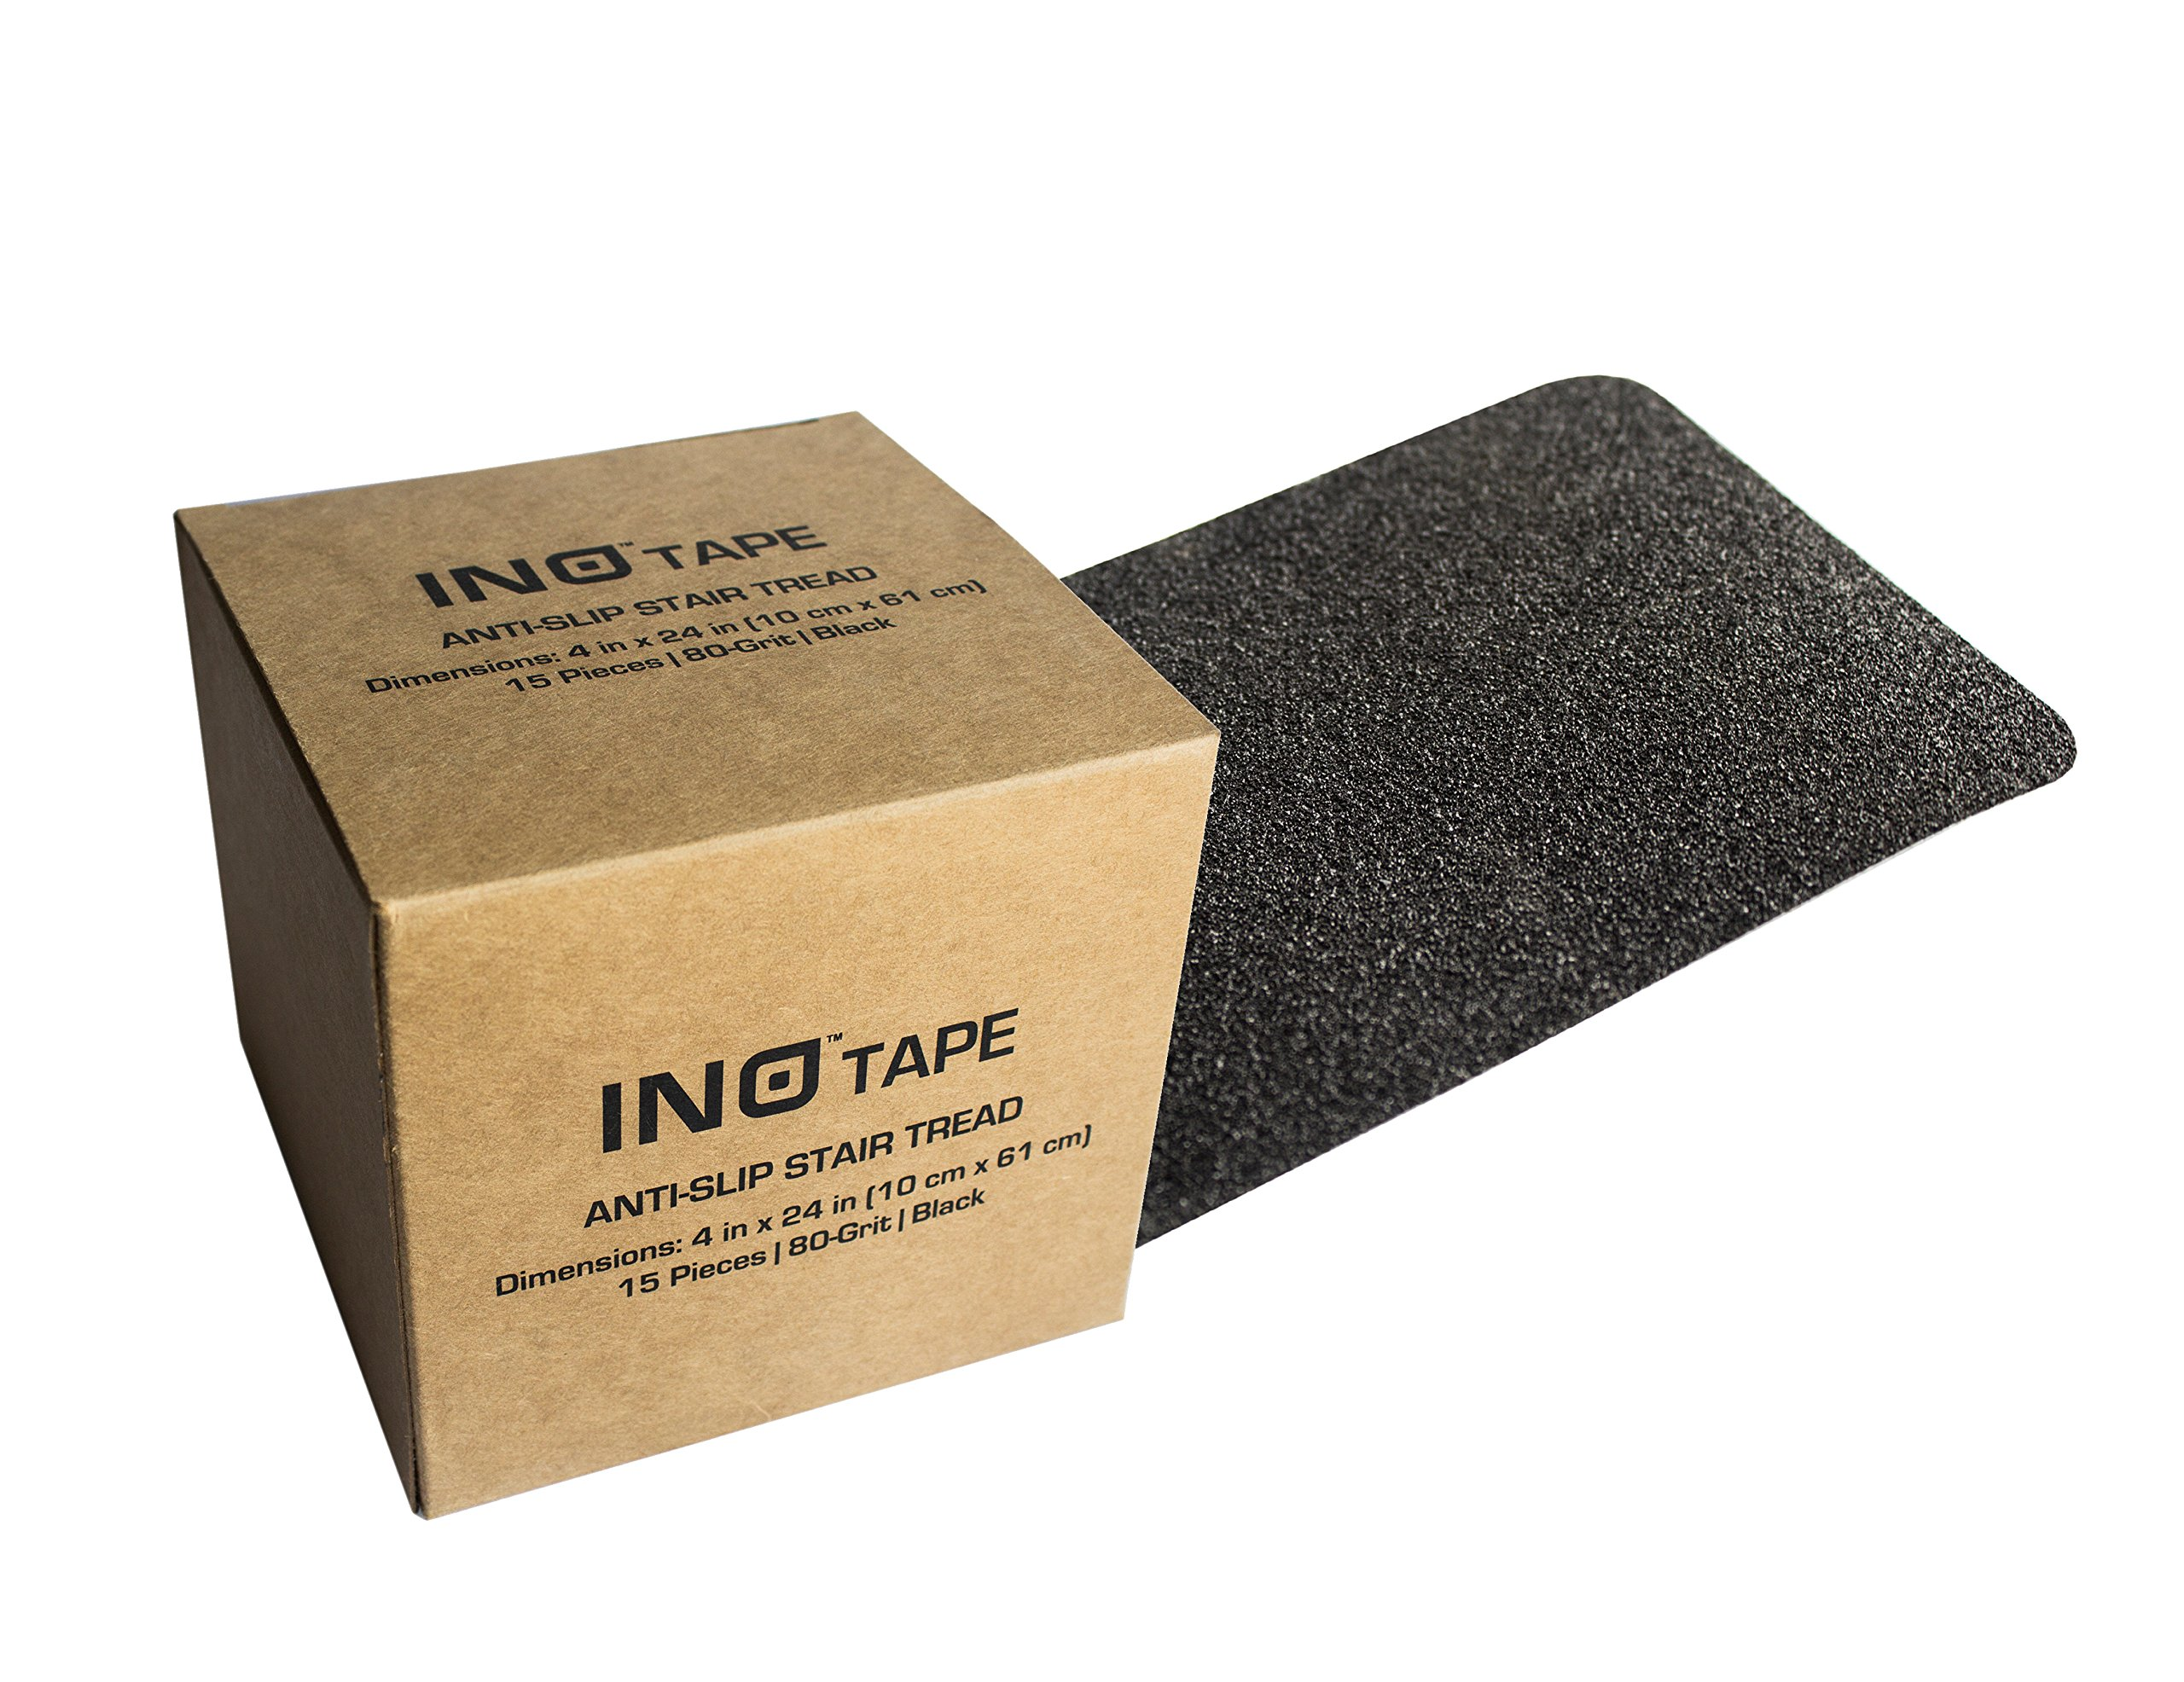 INO Tape Non Slip Adhesive Stair Treads-Indoor, Outdoor anti slip stair treads | 80 Grit, Black, 4'' x 24'', 15 strips per pack covers all stair treads | stair tread | no slip tape | grip tape